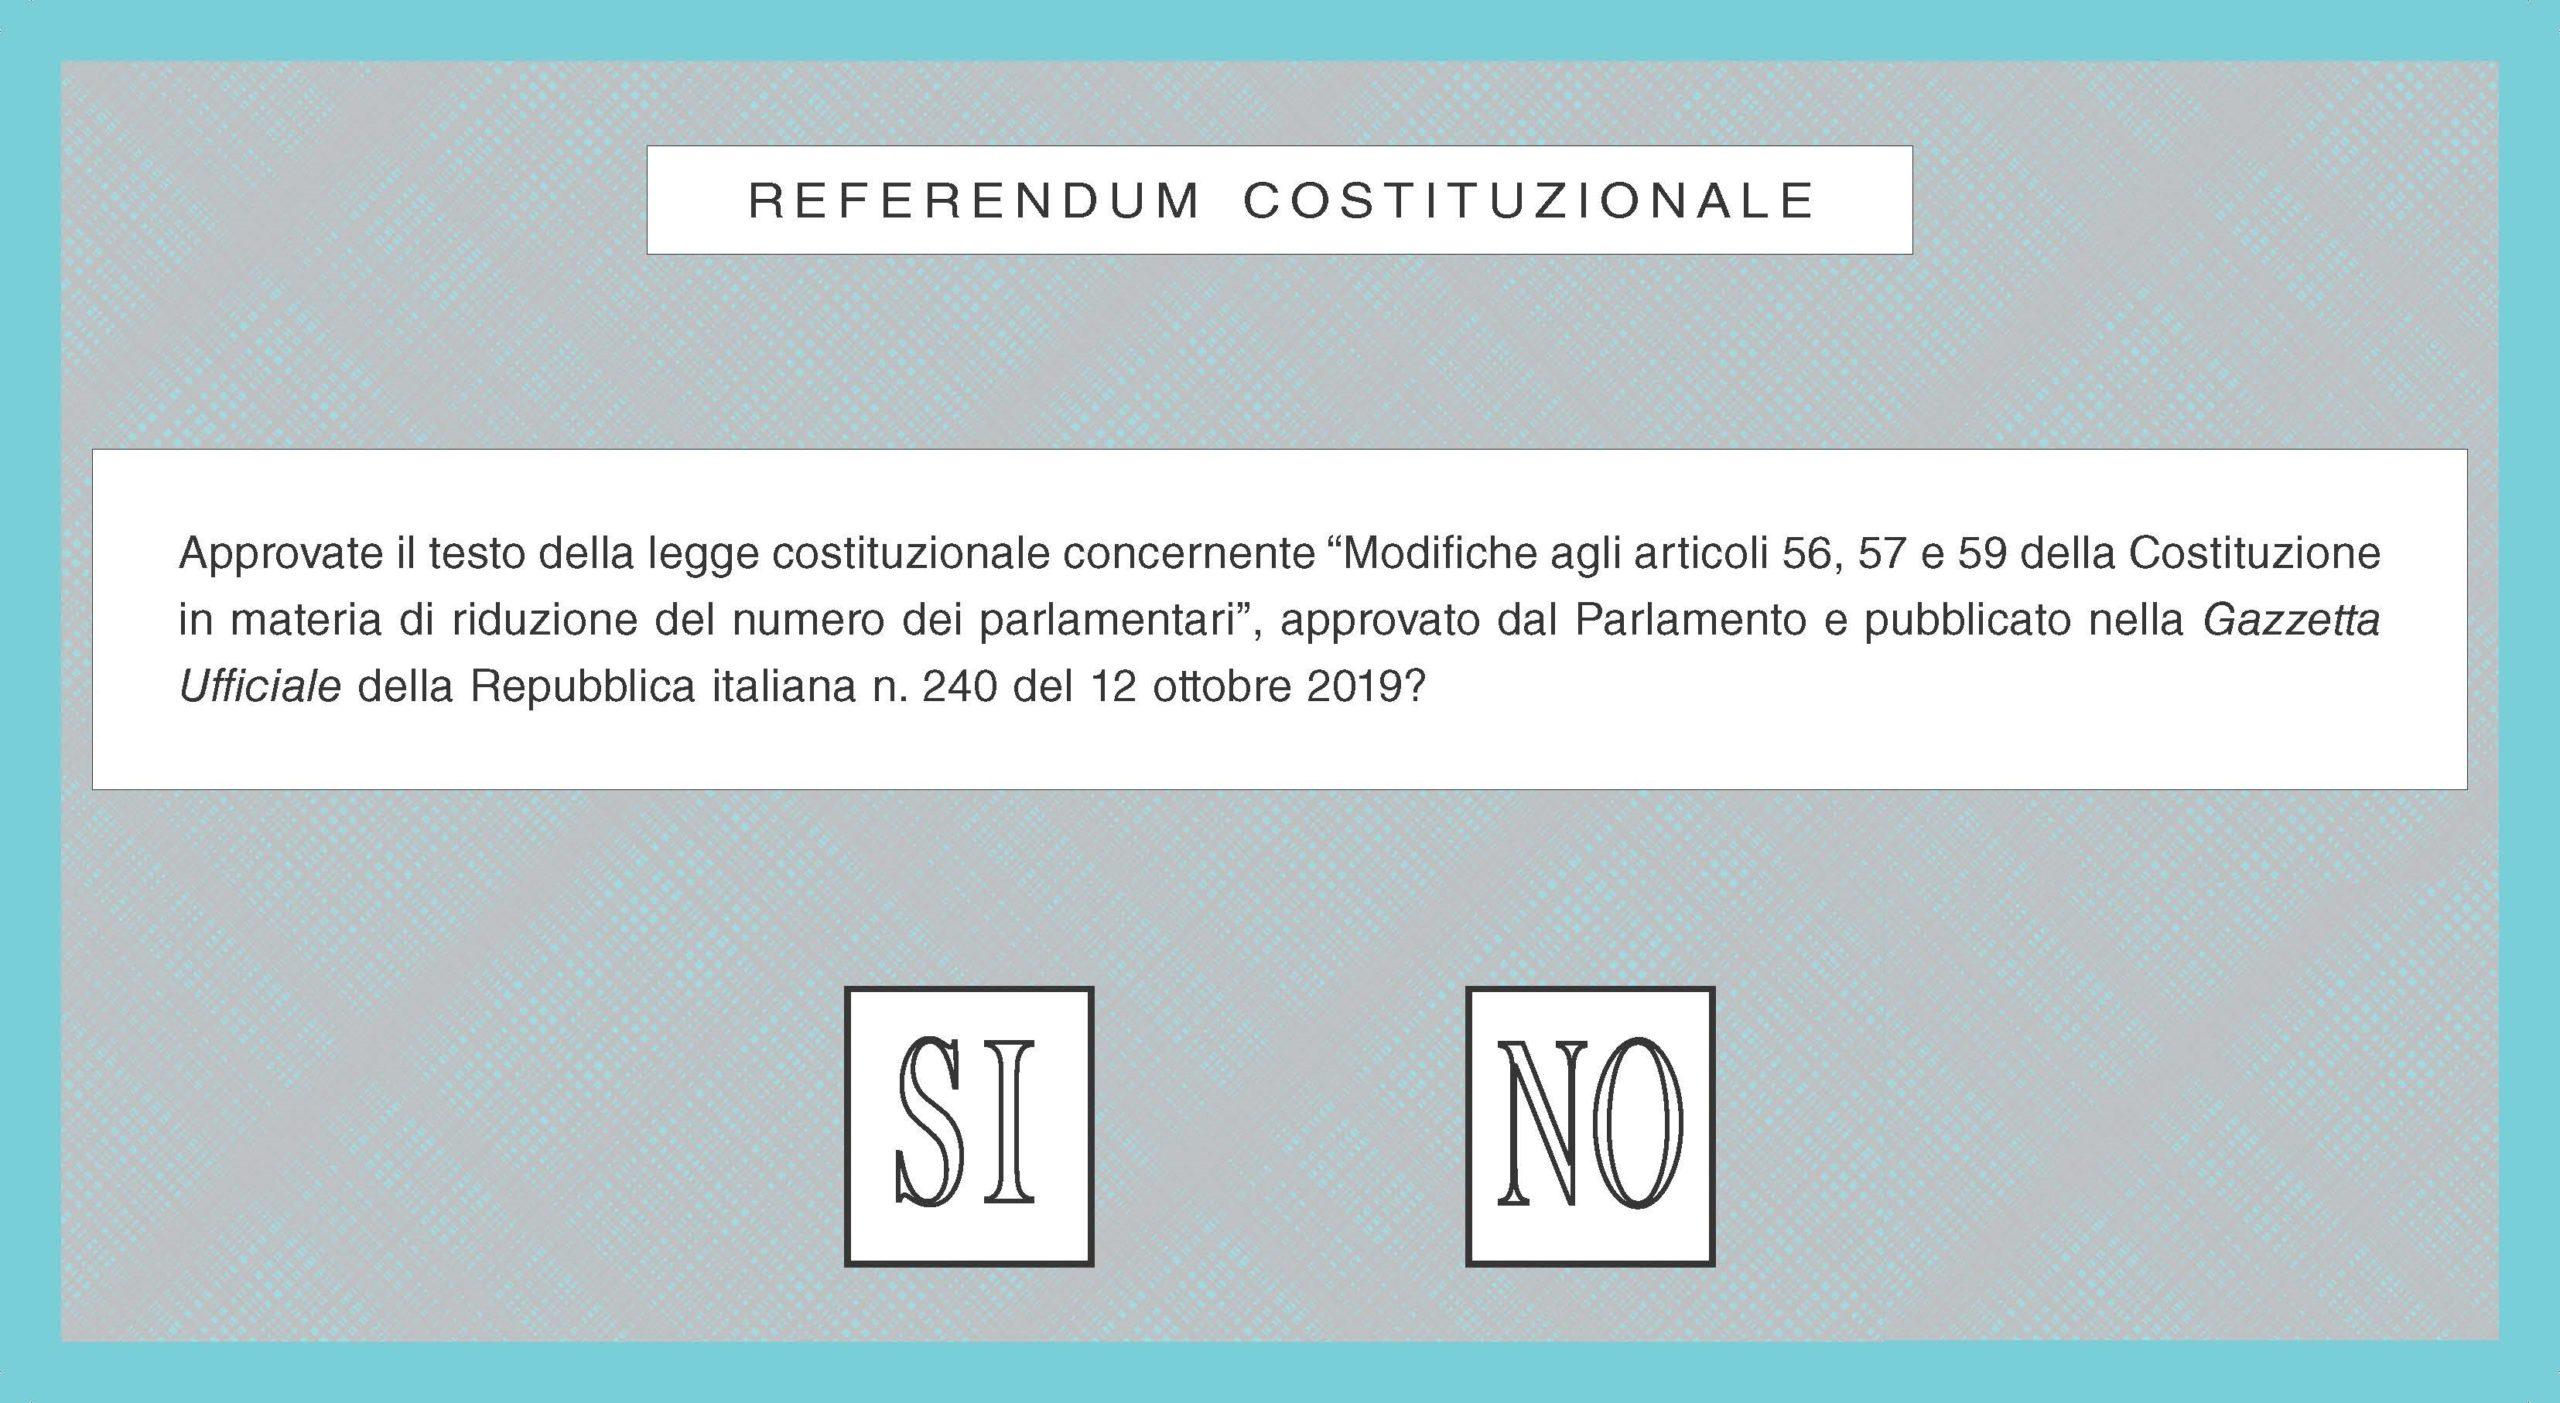 Risultati Referendum Costituzionale 2020